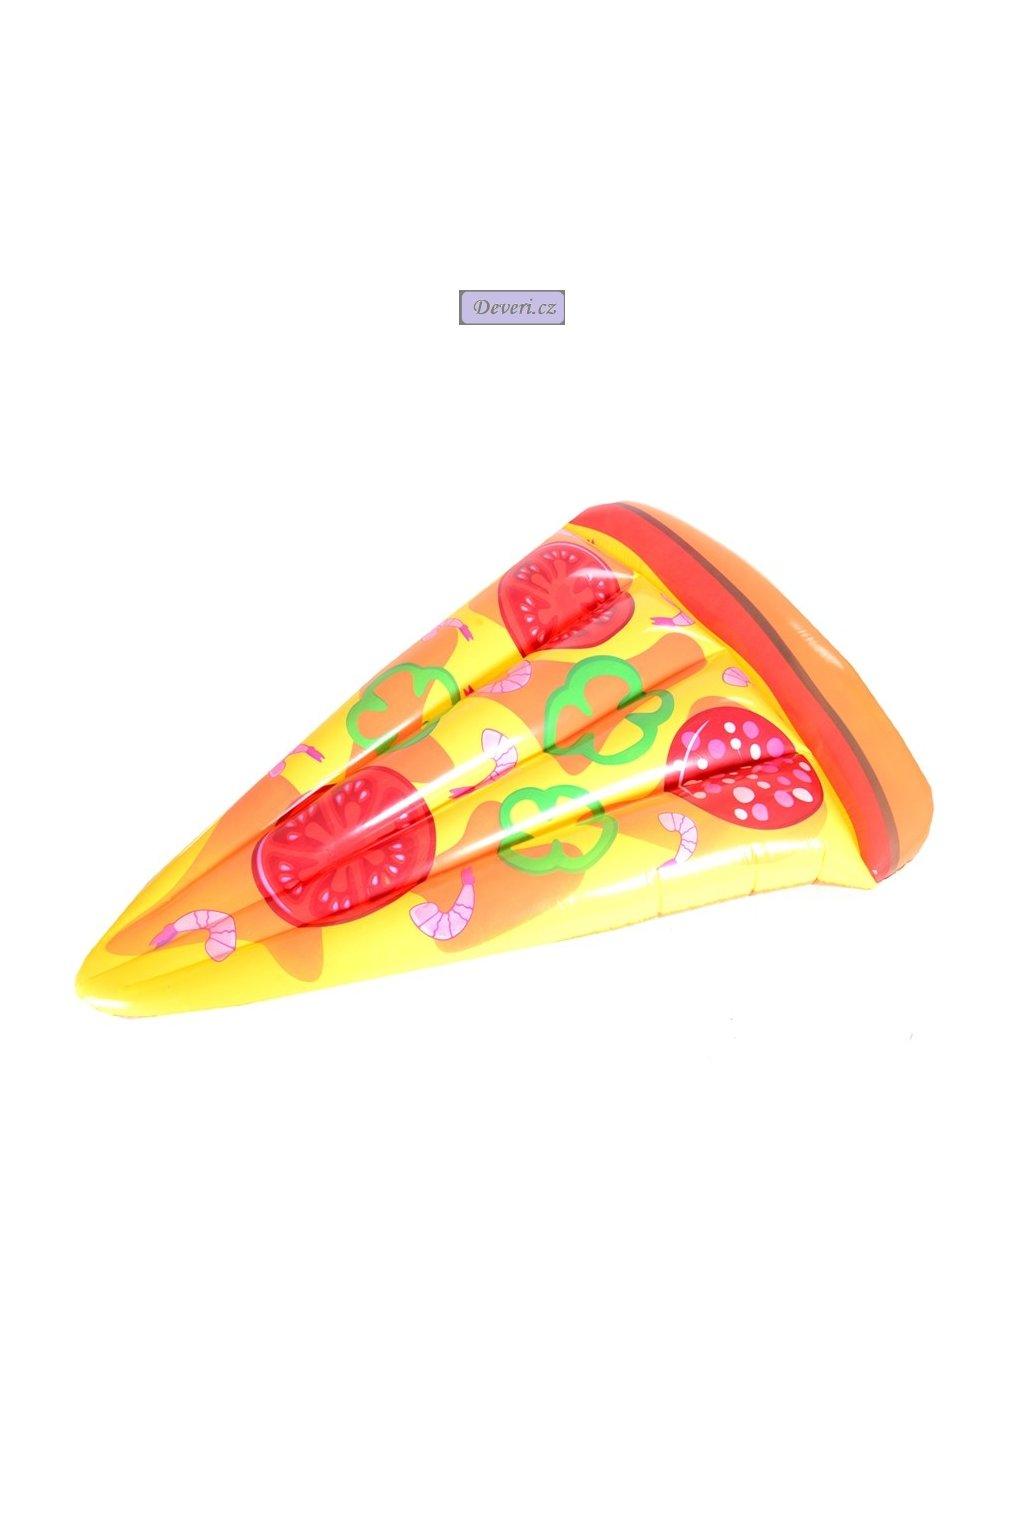 MATERAC DMUCHANY PIZZA XL